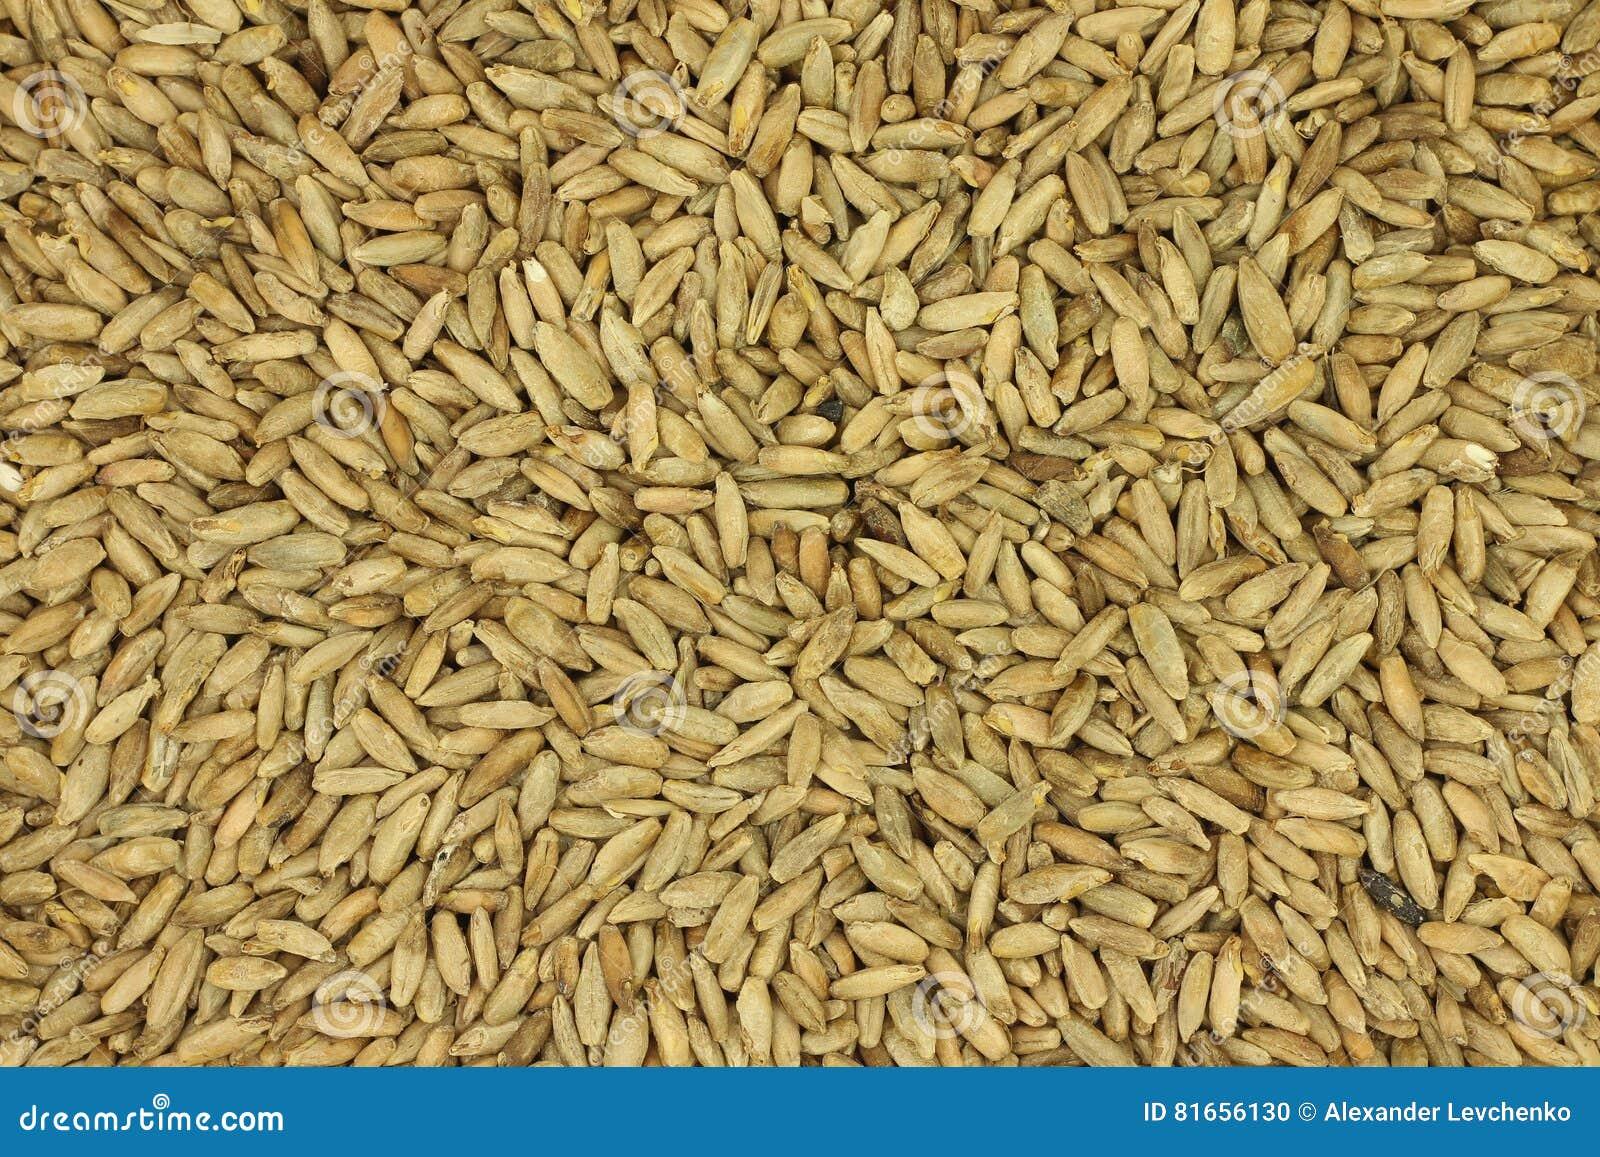 Grain rye malt background